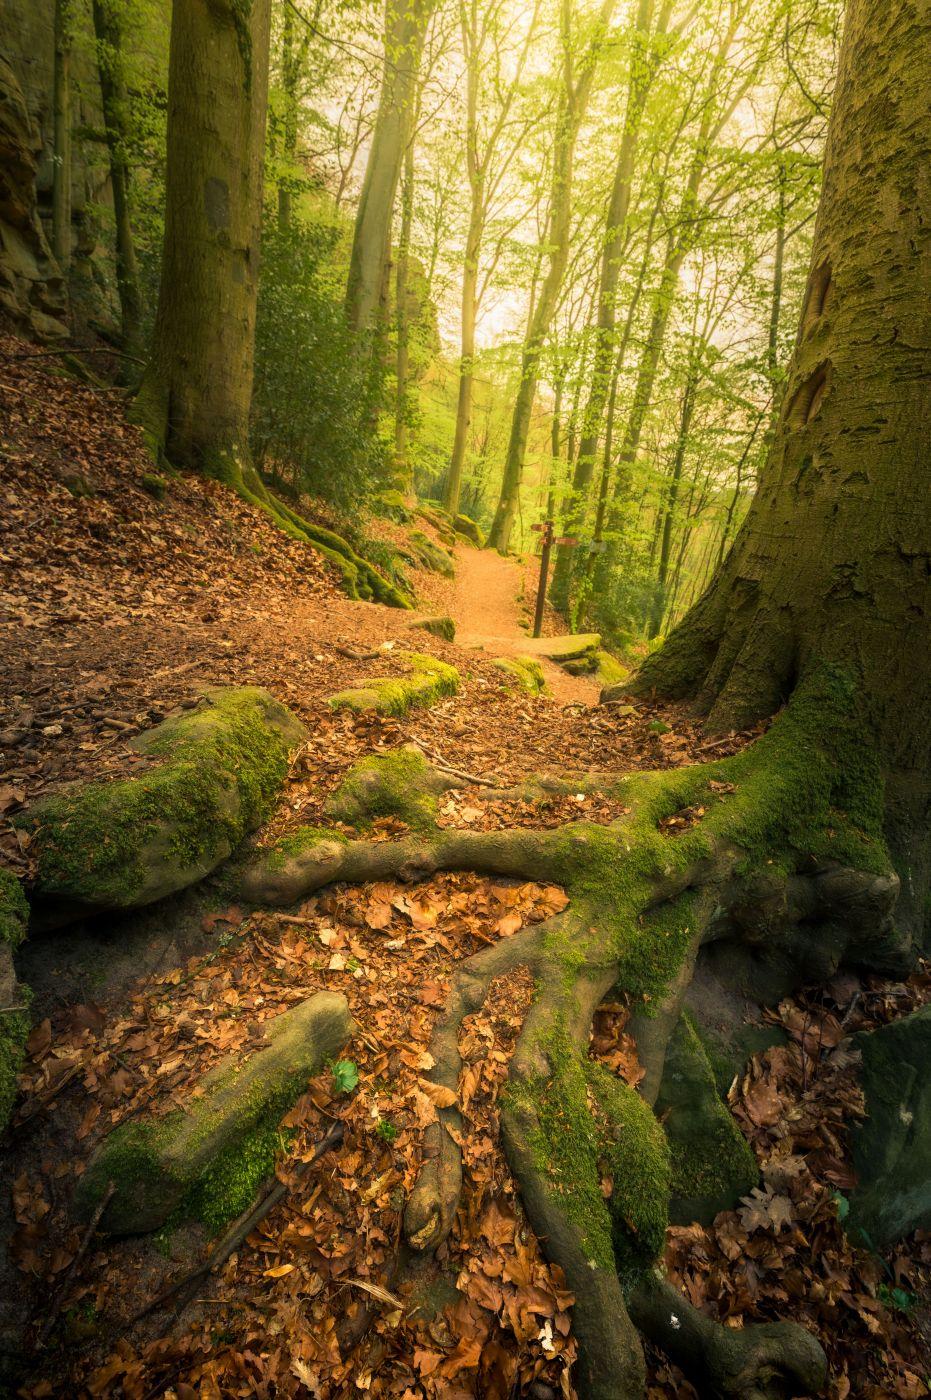 Naturentdeckungspfad, Luxembourg